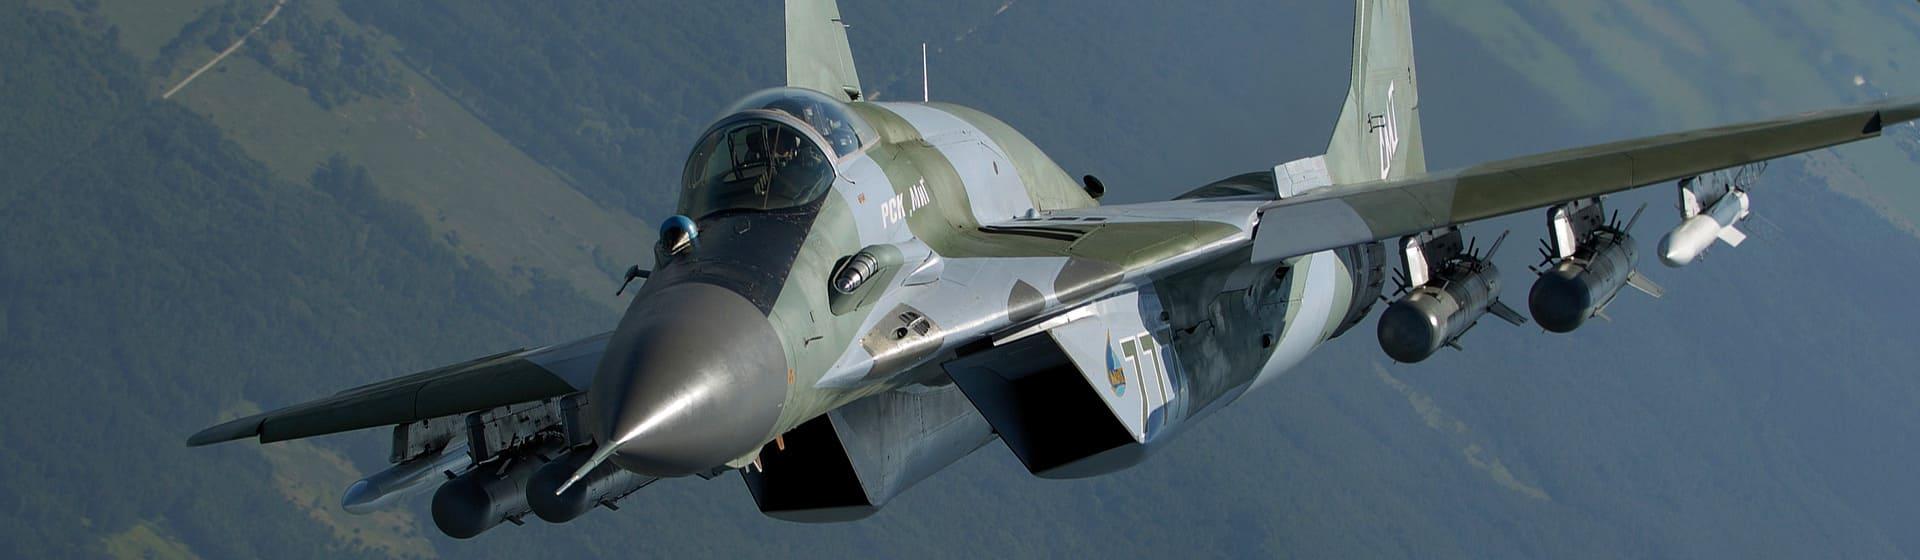 ВВС - Скатерти